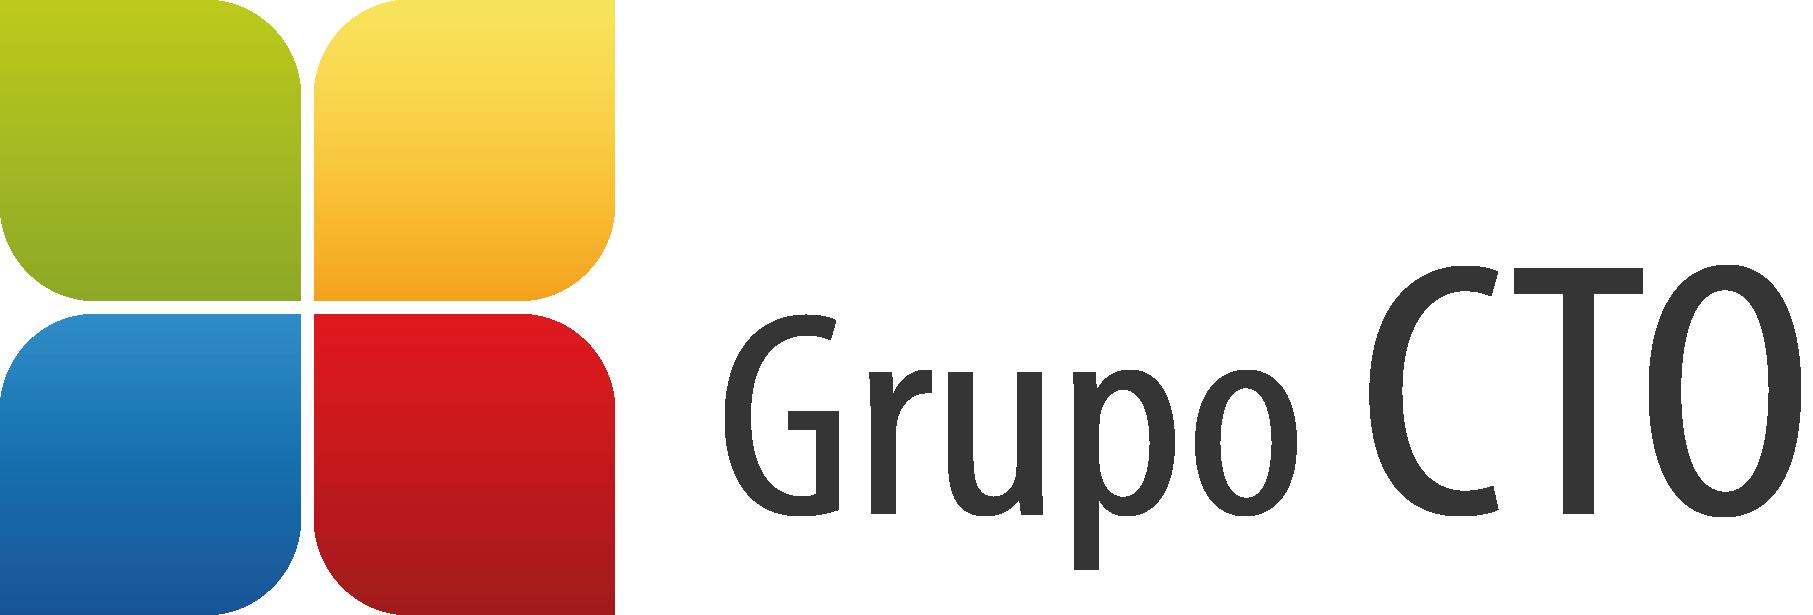 GrupoCTO